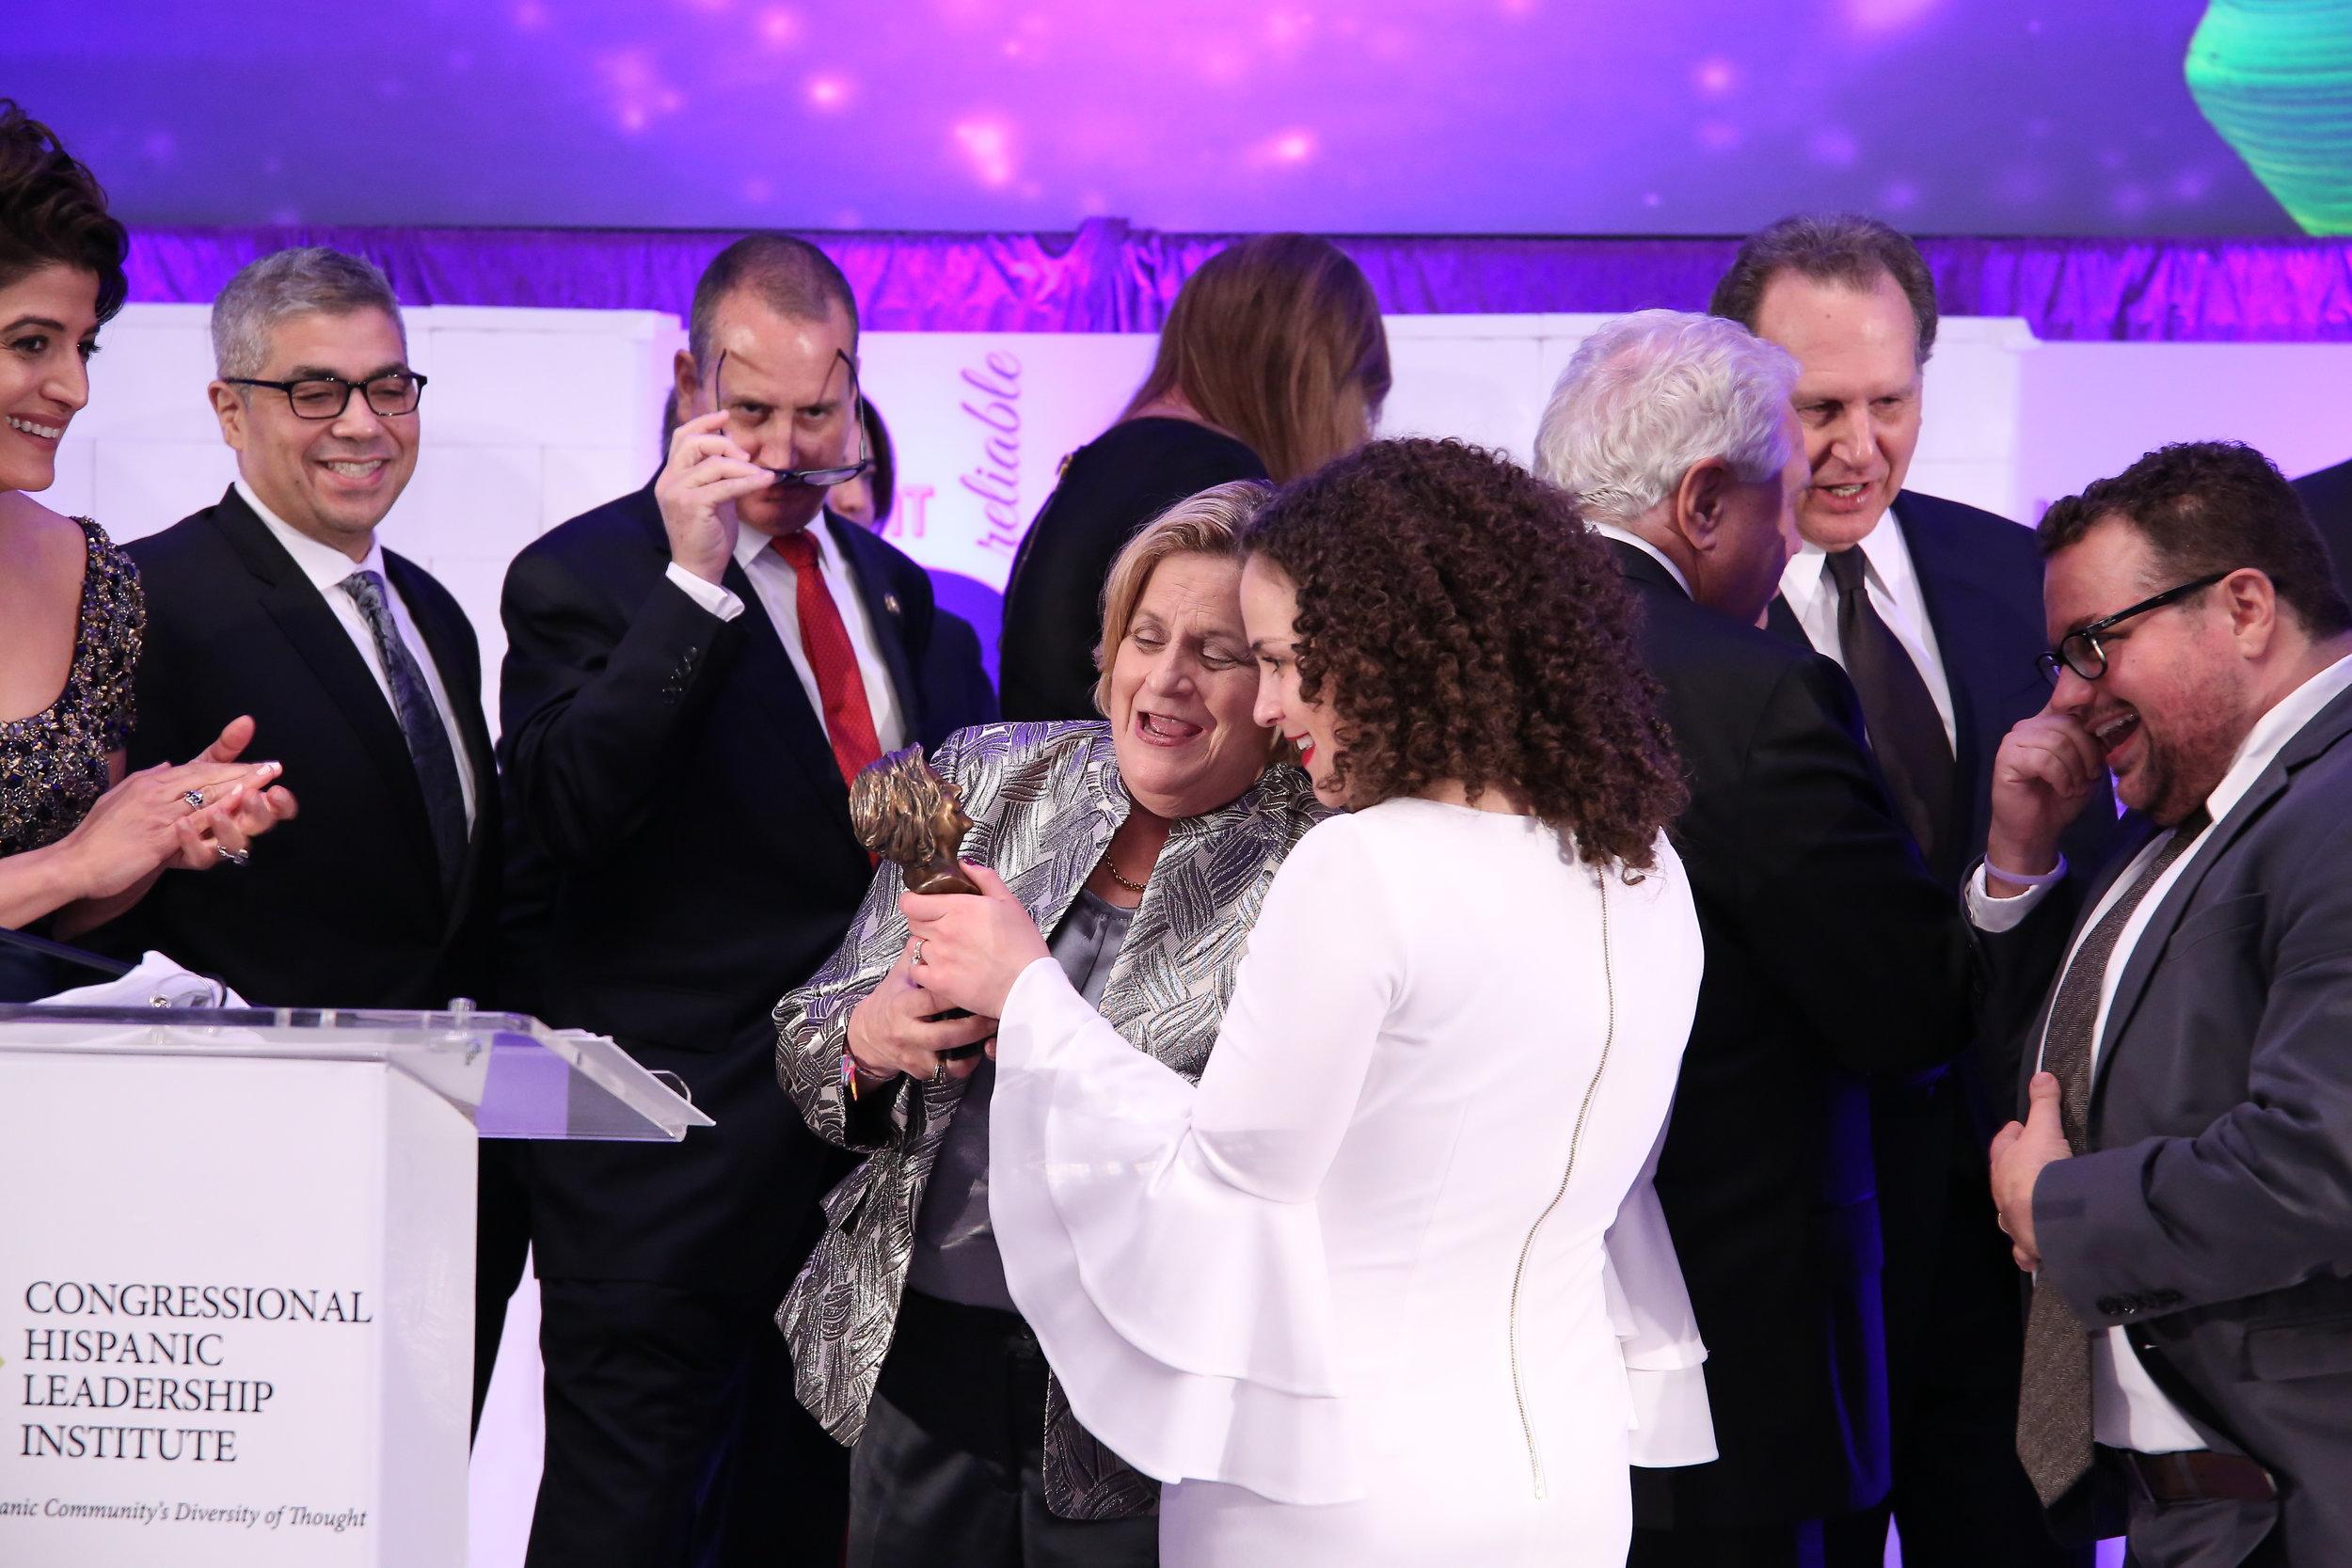 Photos - CHLI Annual Gala & Leadership Awards